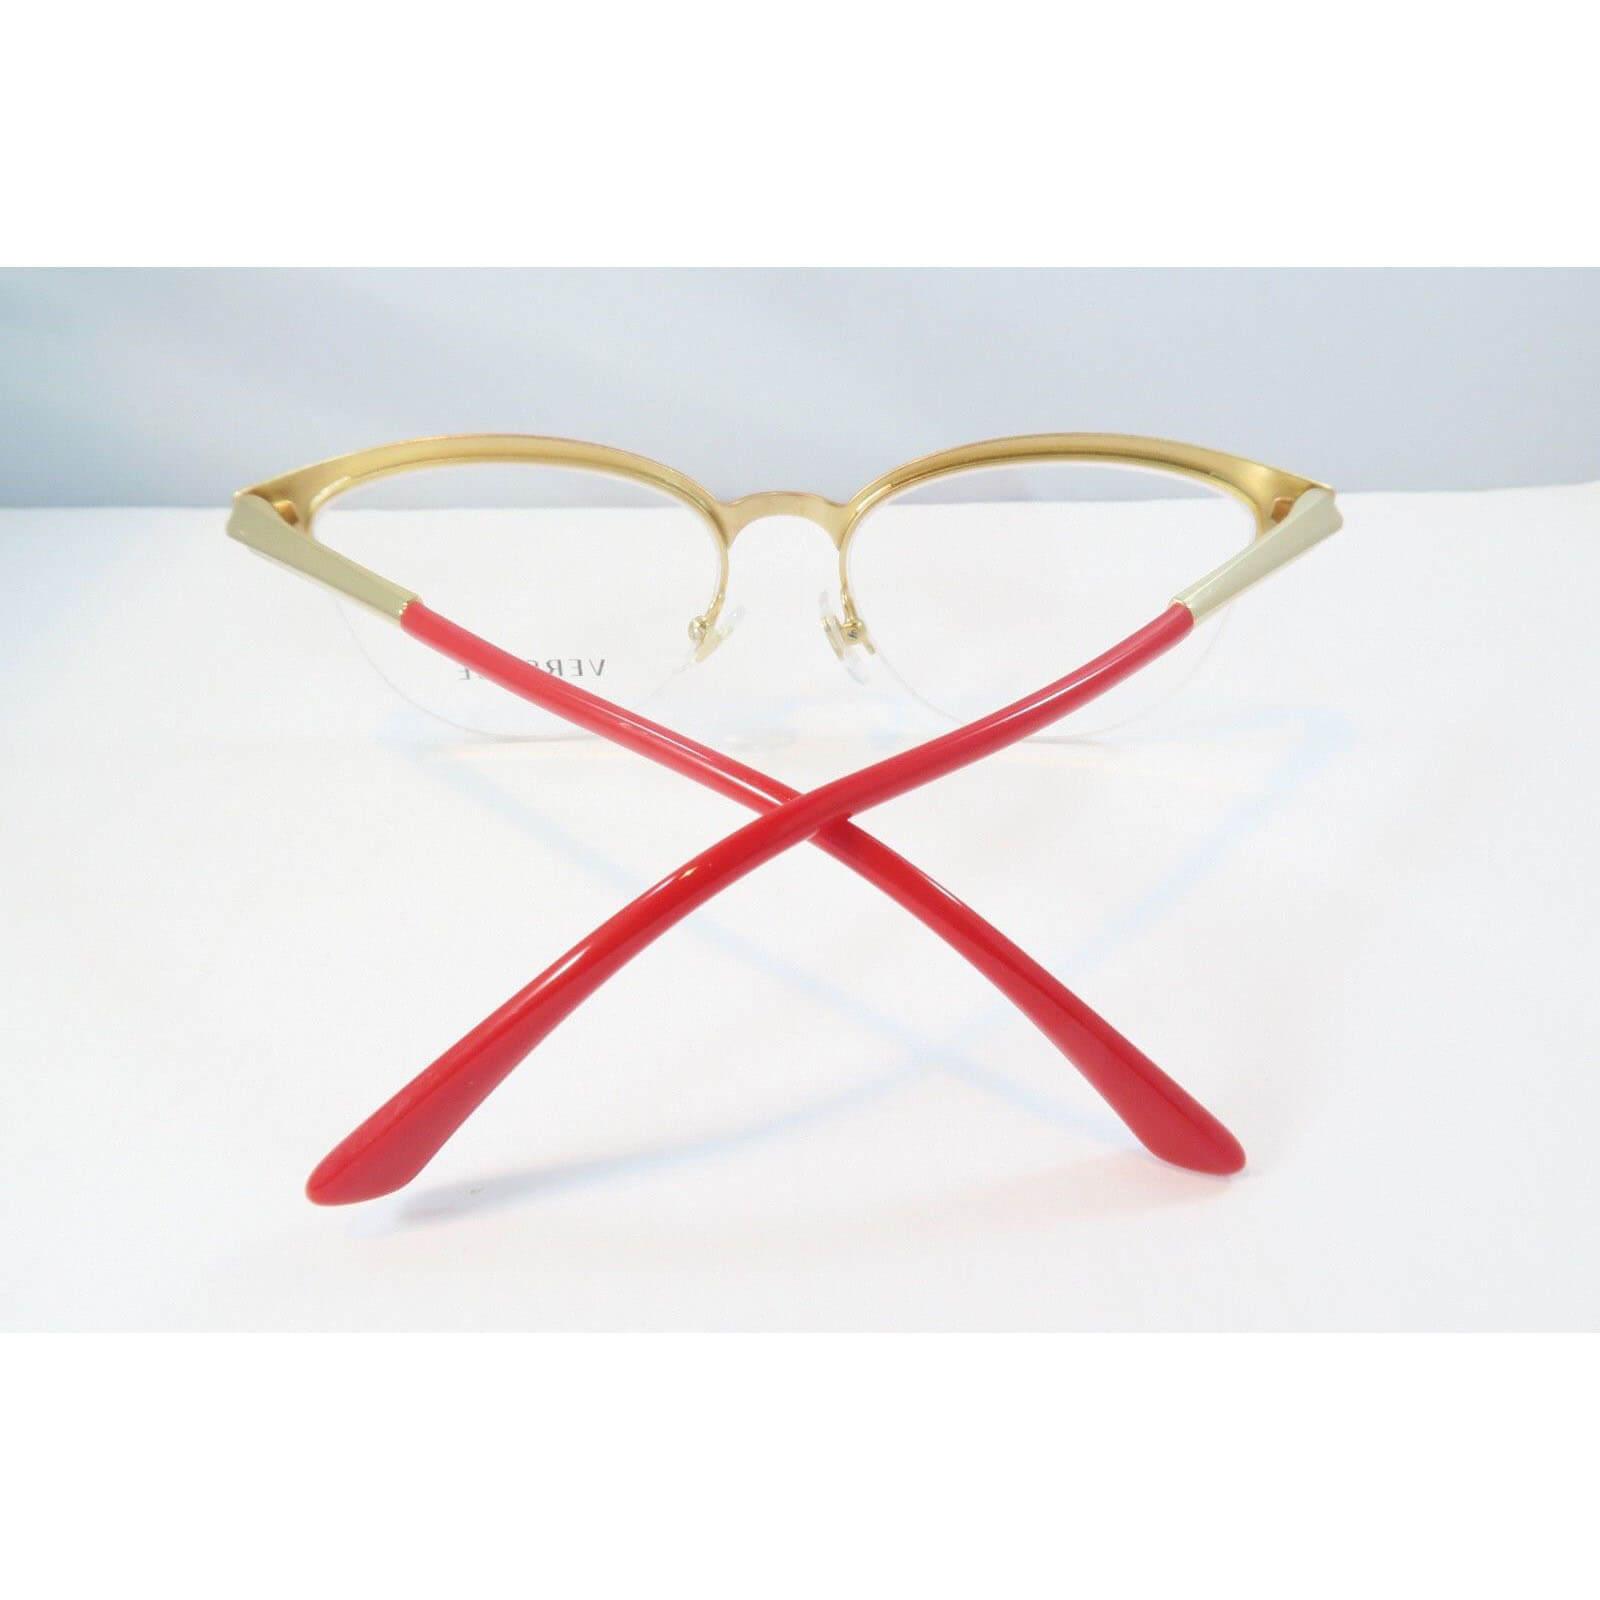 c665399c346b4 Versace MOD 1235 1376 Semi-Rimless Gold Red Eyeglasses